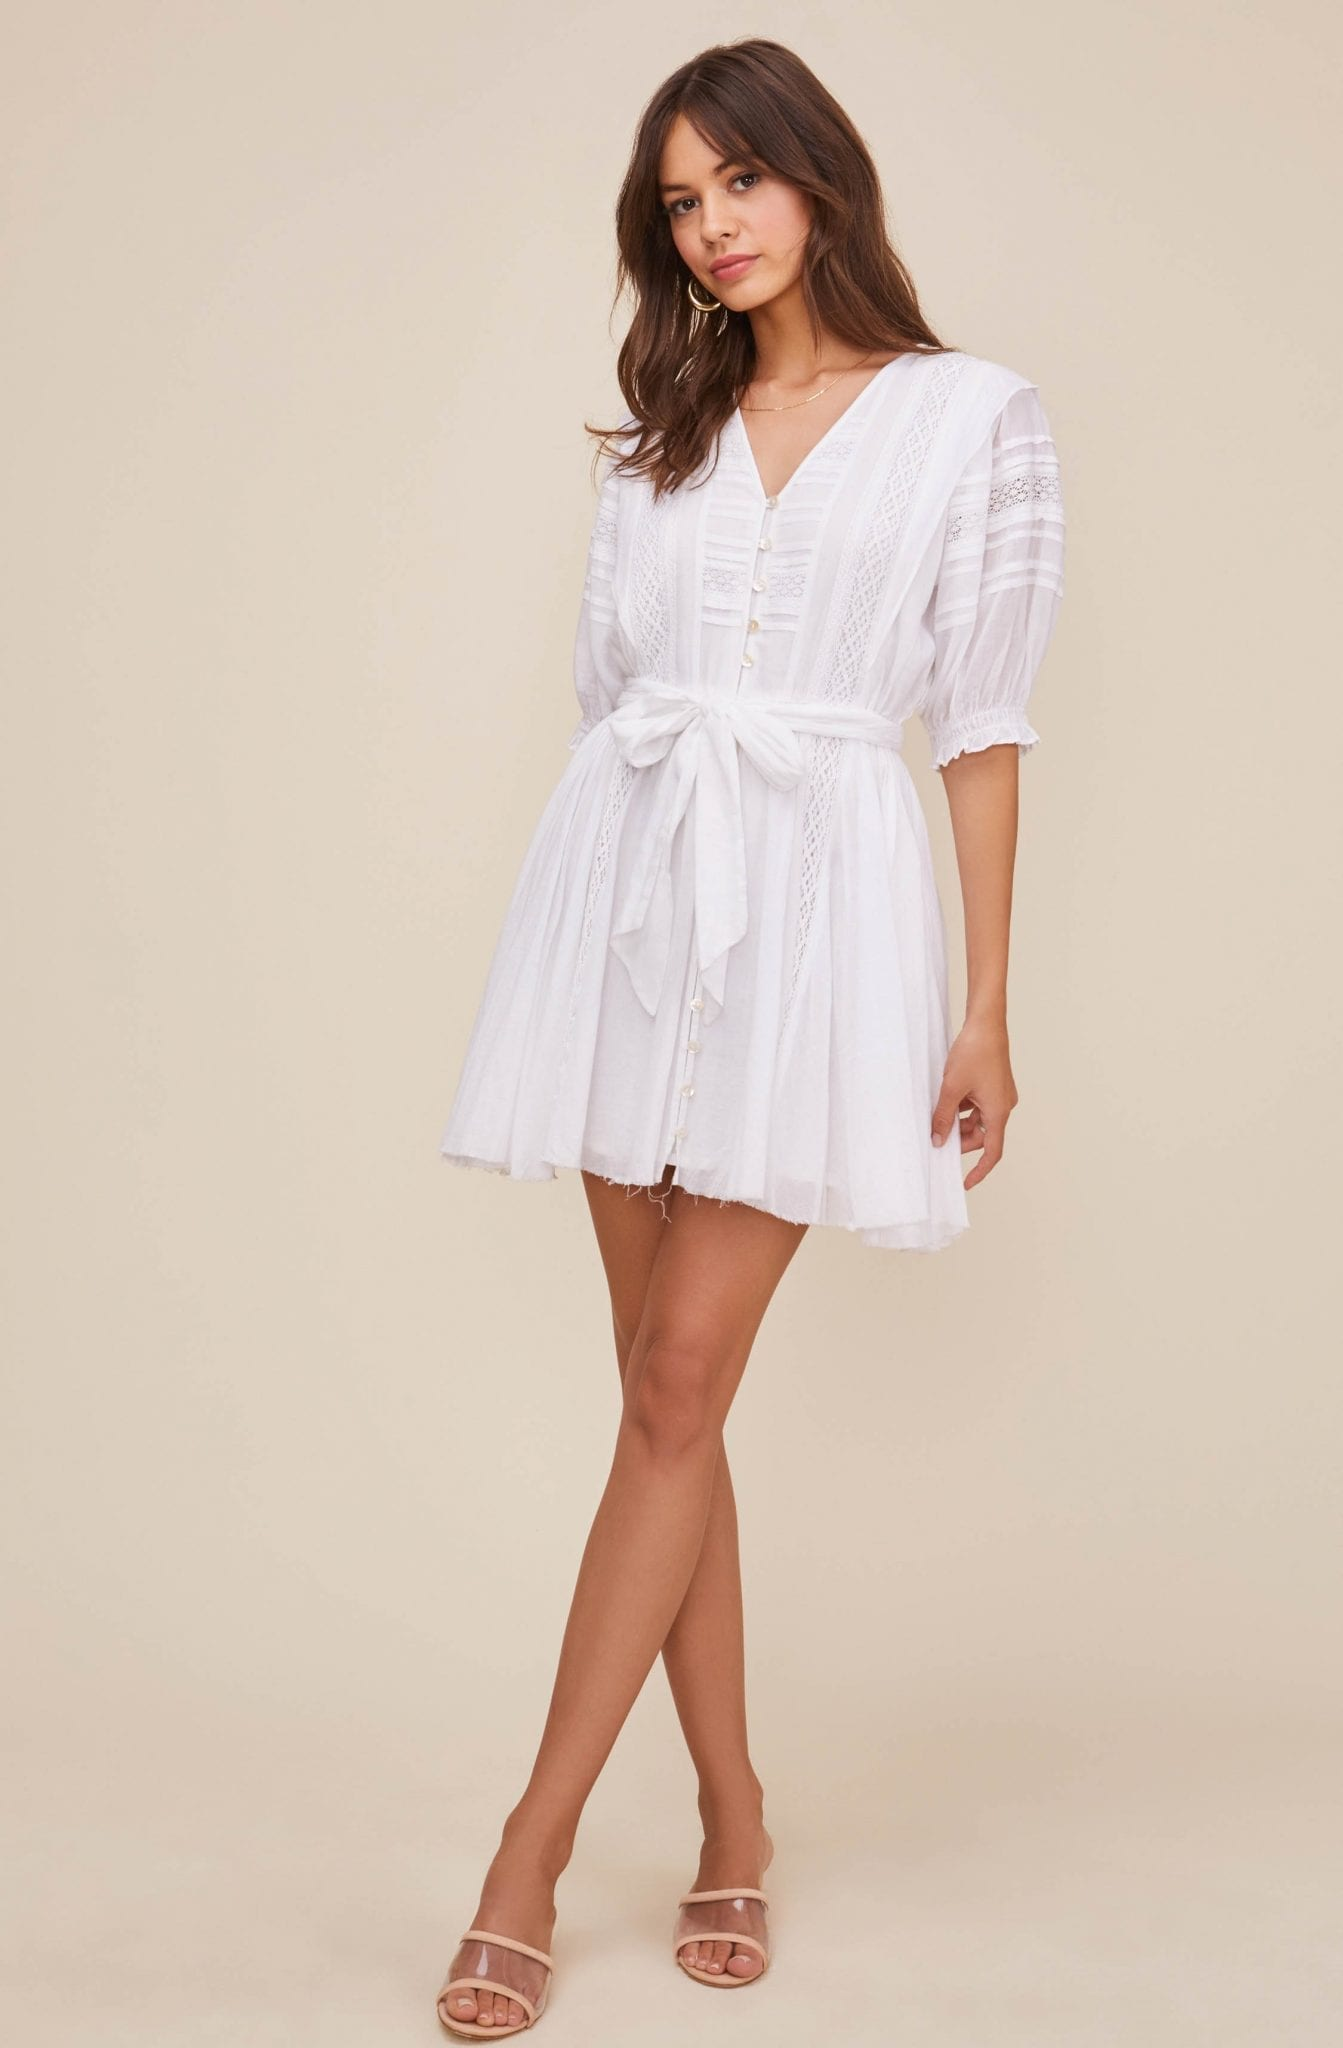 ASTRTHELABEL Remedy Puff Sleeve Dress